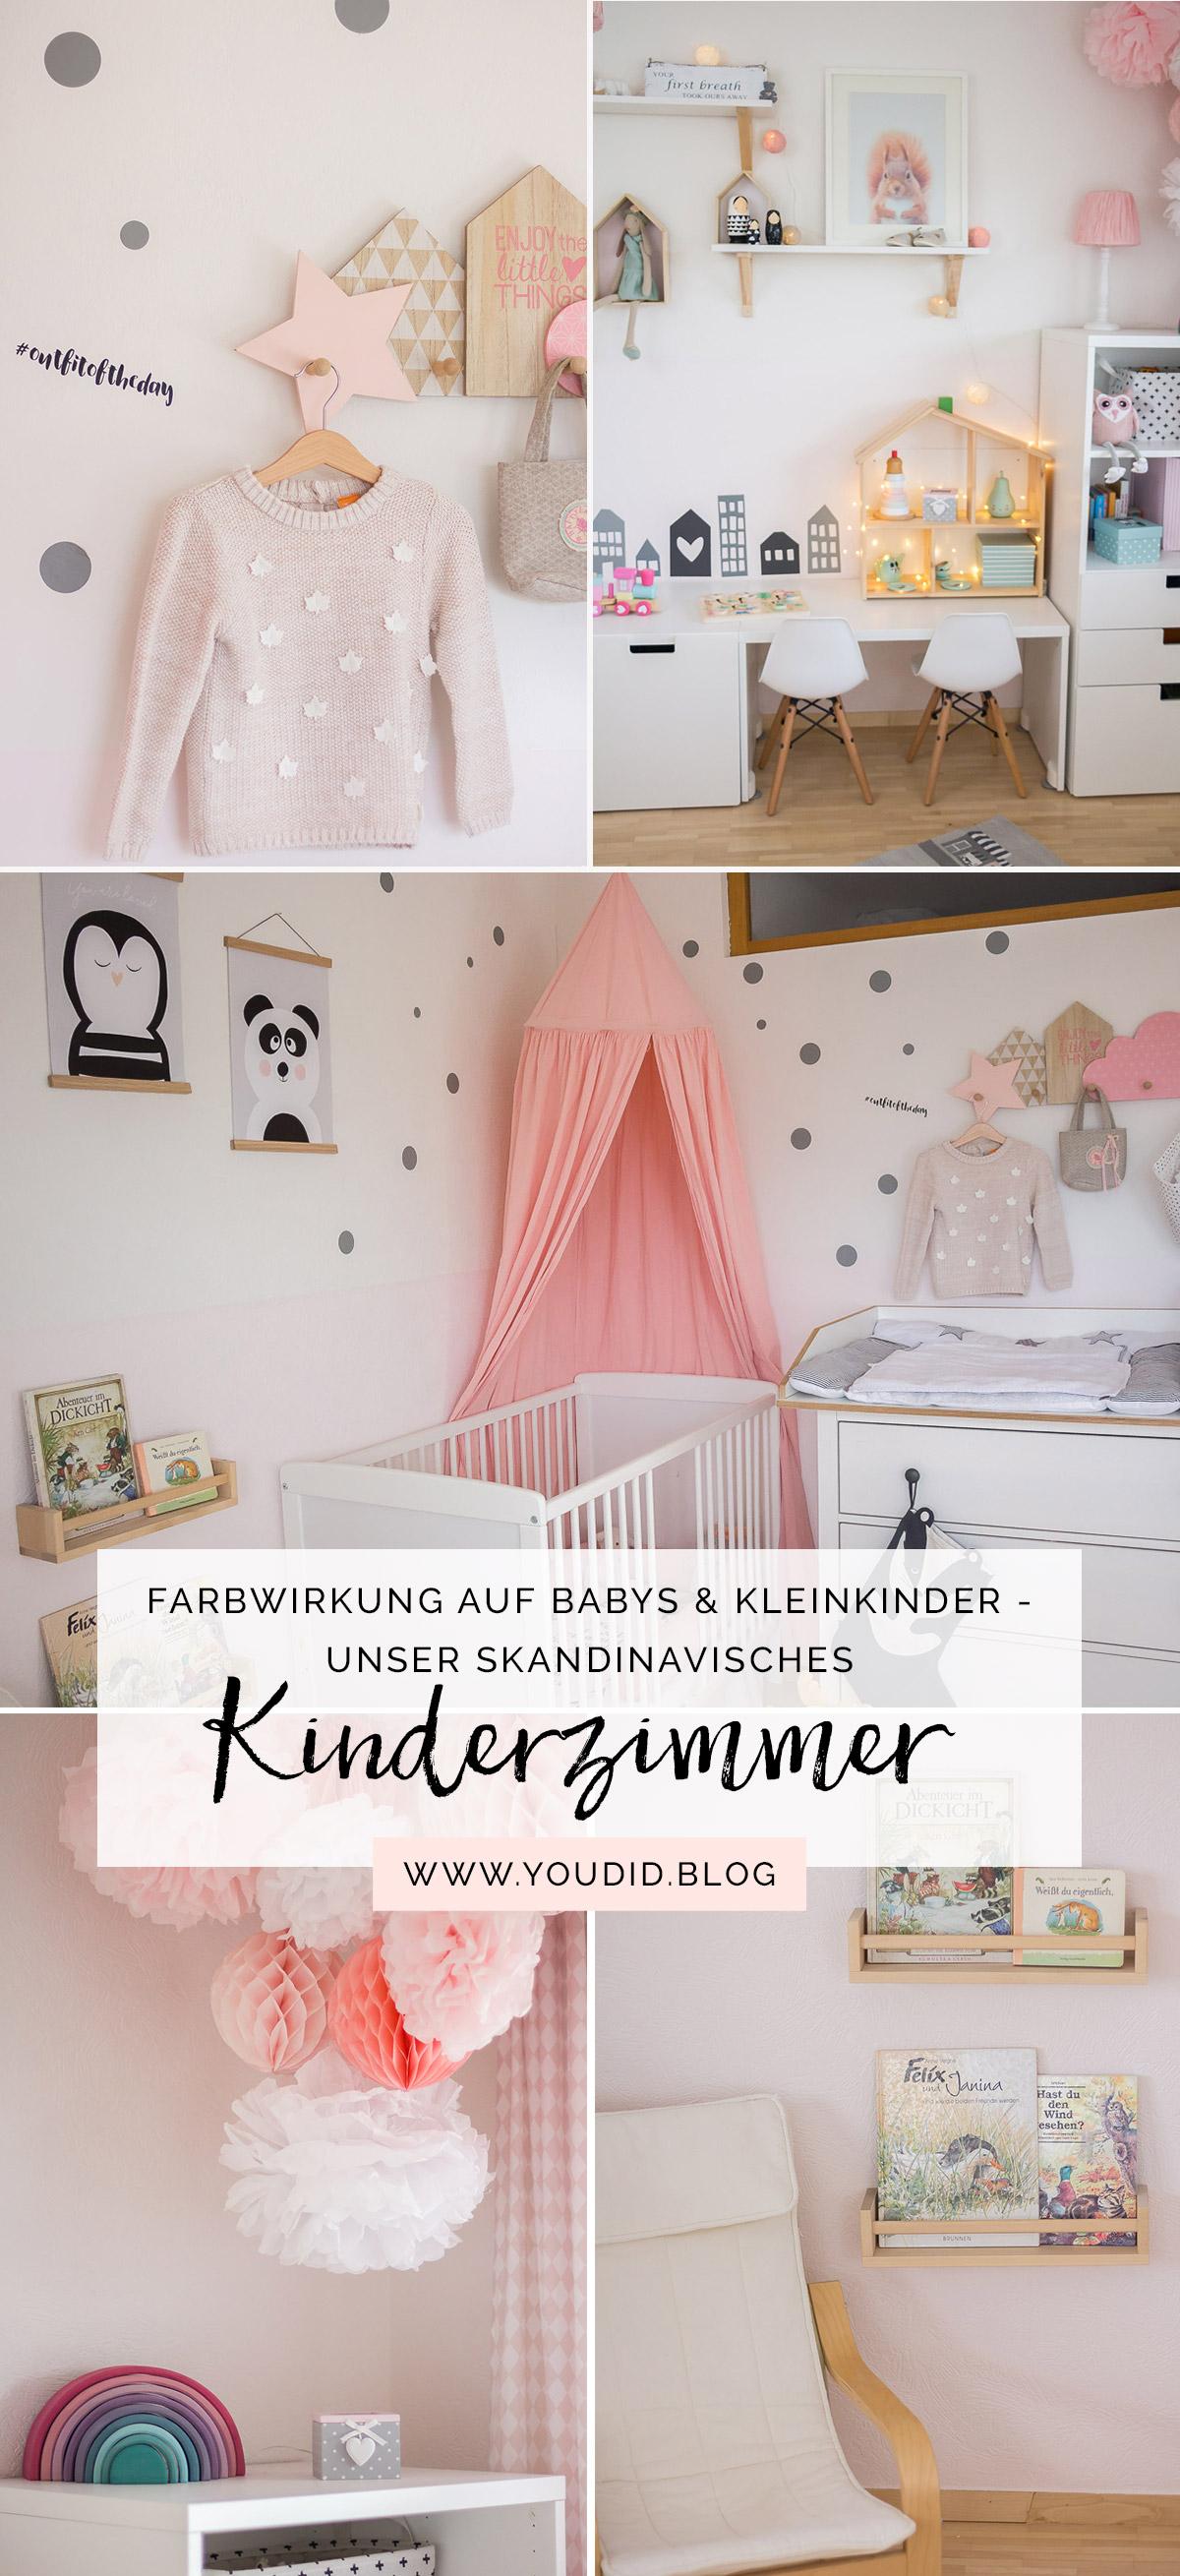 skandinavisches Kinderzimmer nordic kidsroom girlsroom in pink and blush | https://youdid.blog